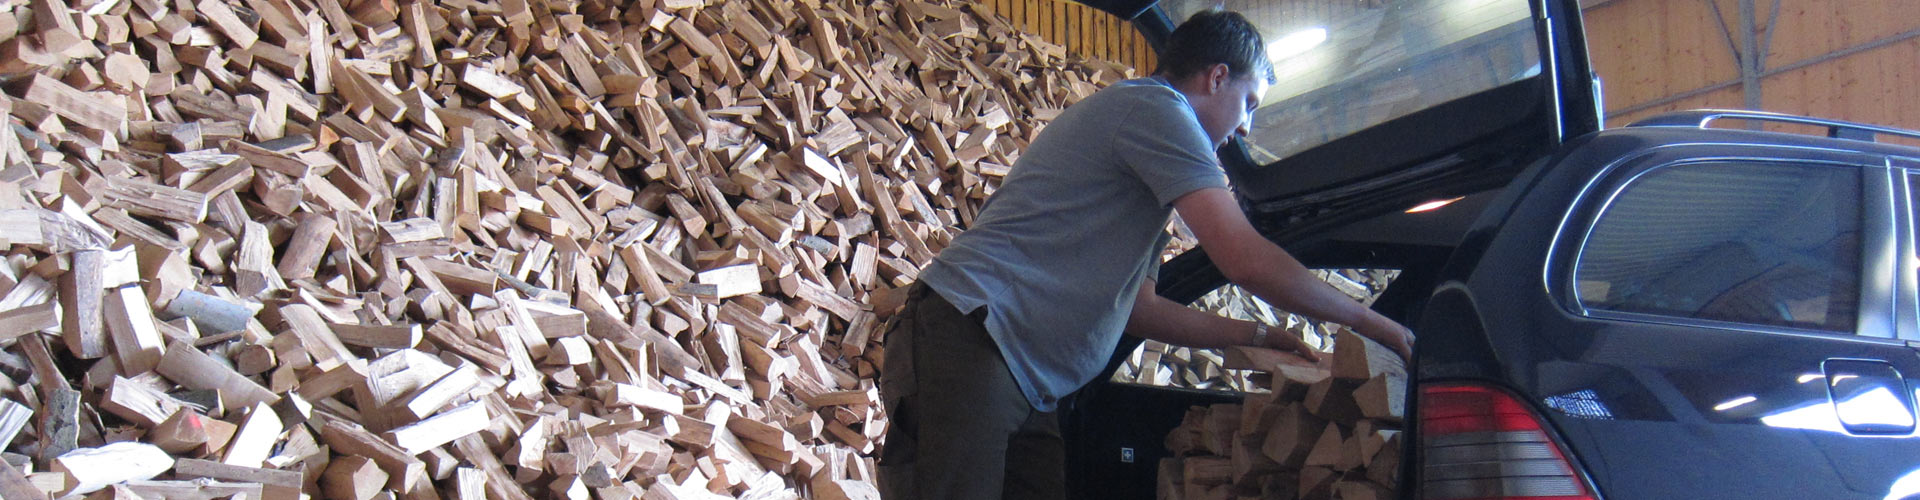 Brennholz vom Energiehof Ellingen